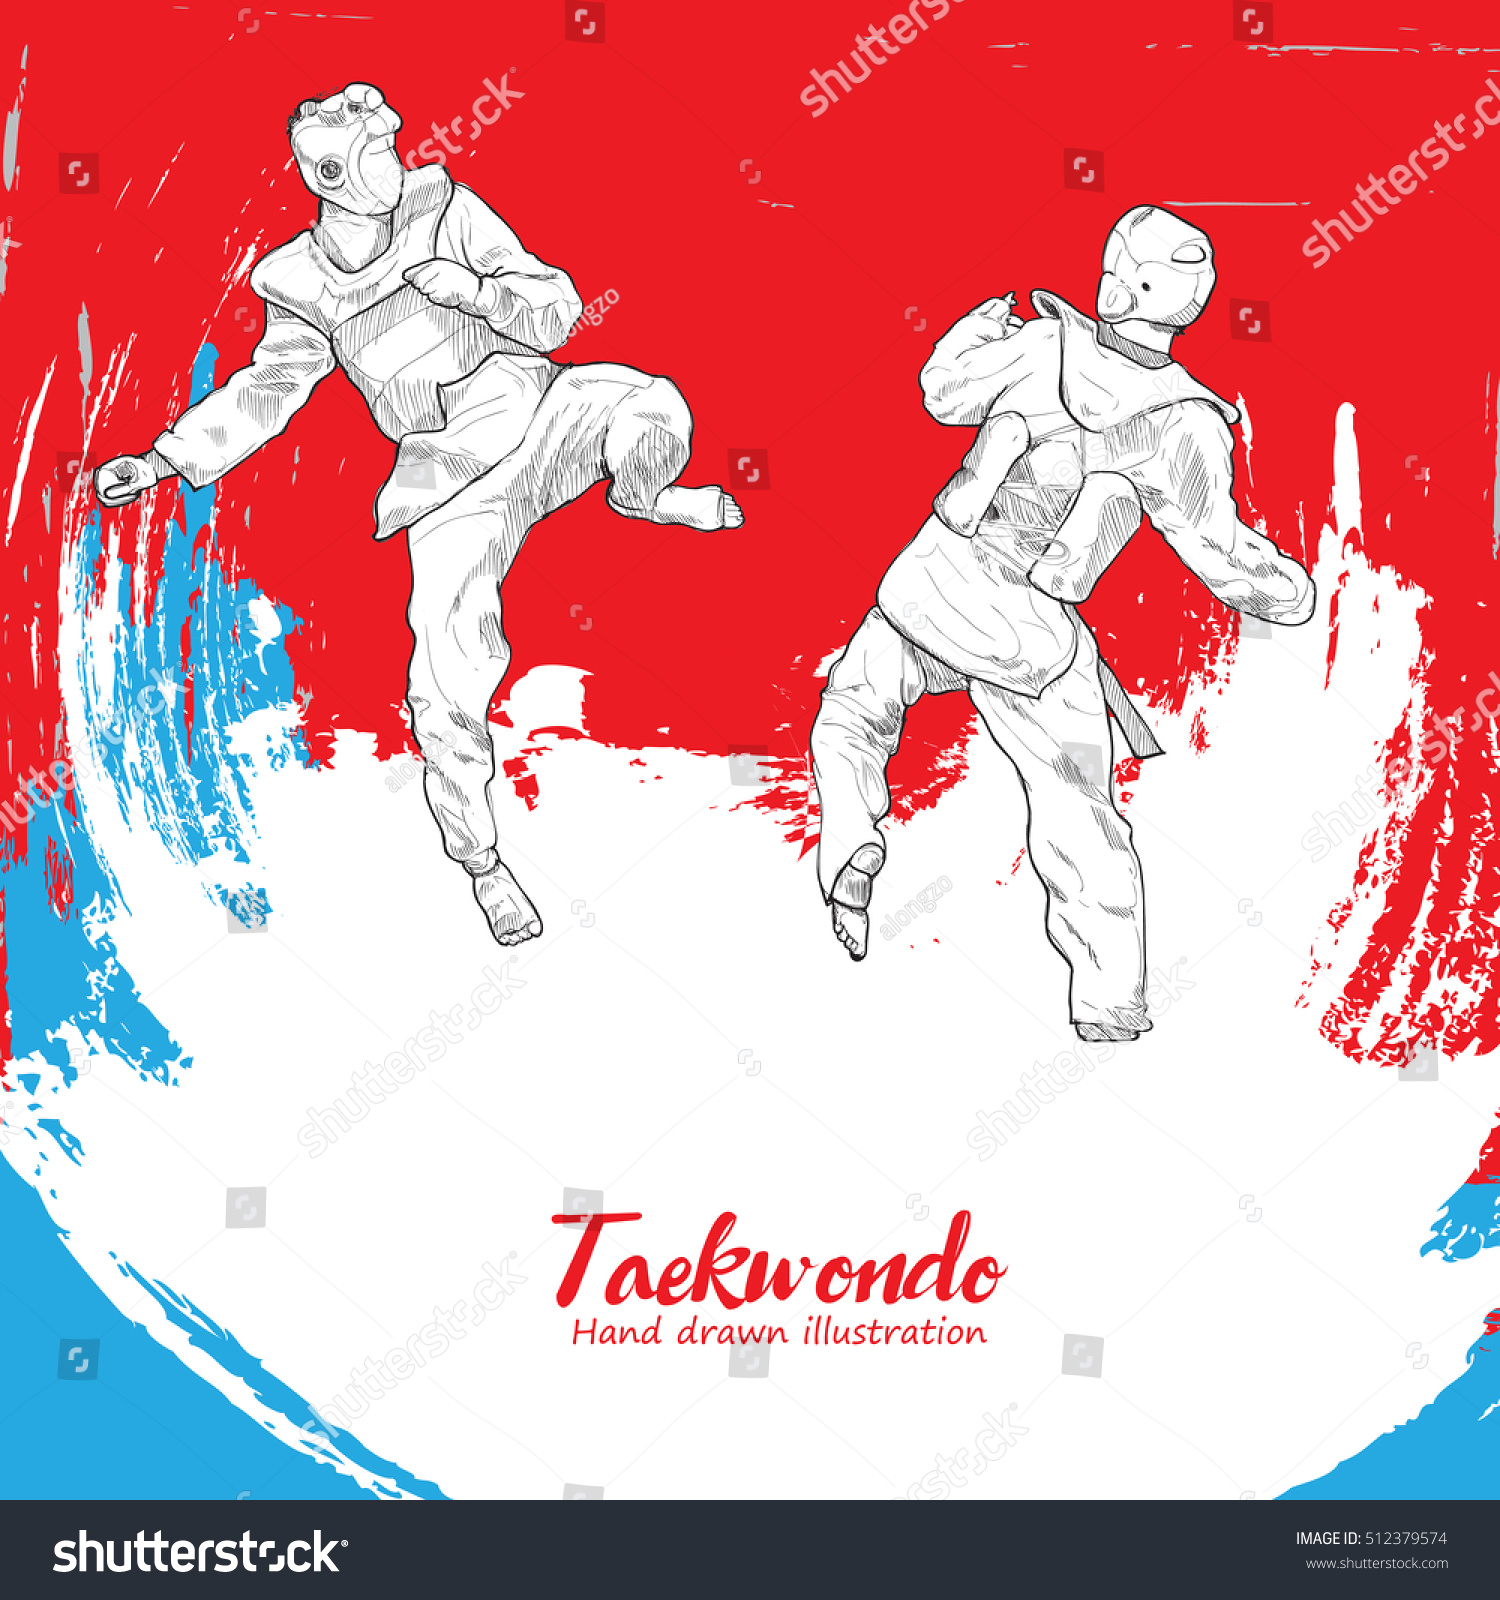 Taekwondo Background Design Hand Drawn Stock Vector Royalty 1500x1600